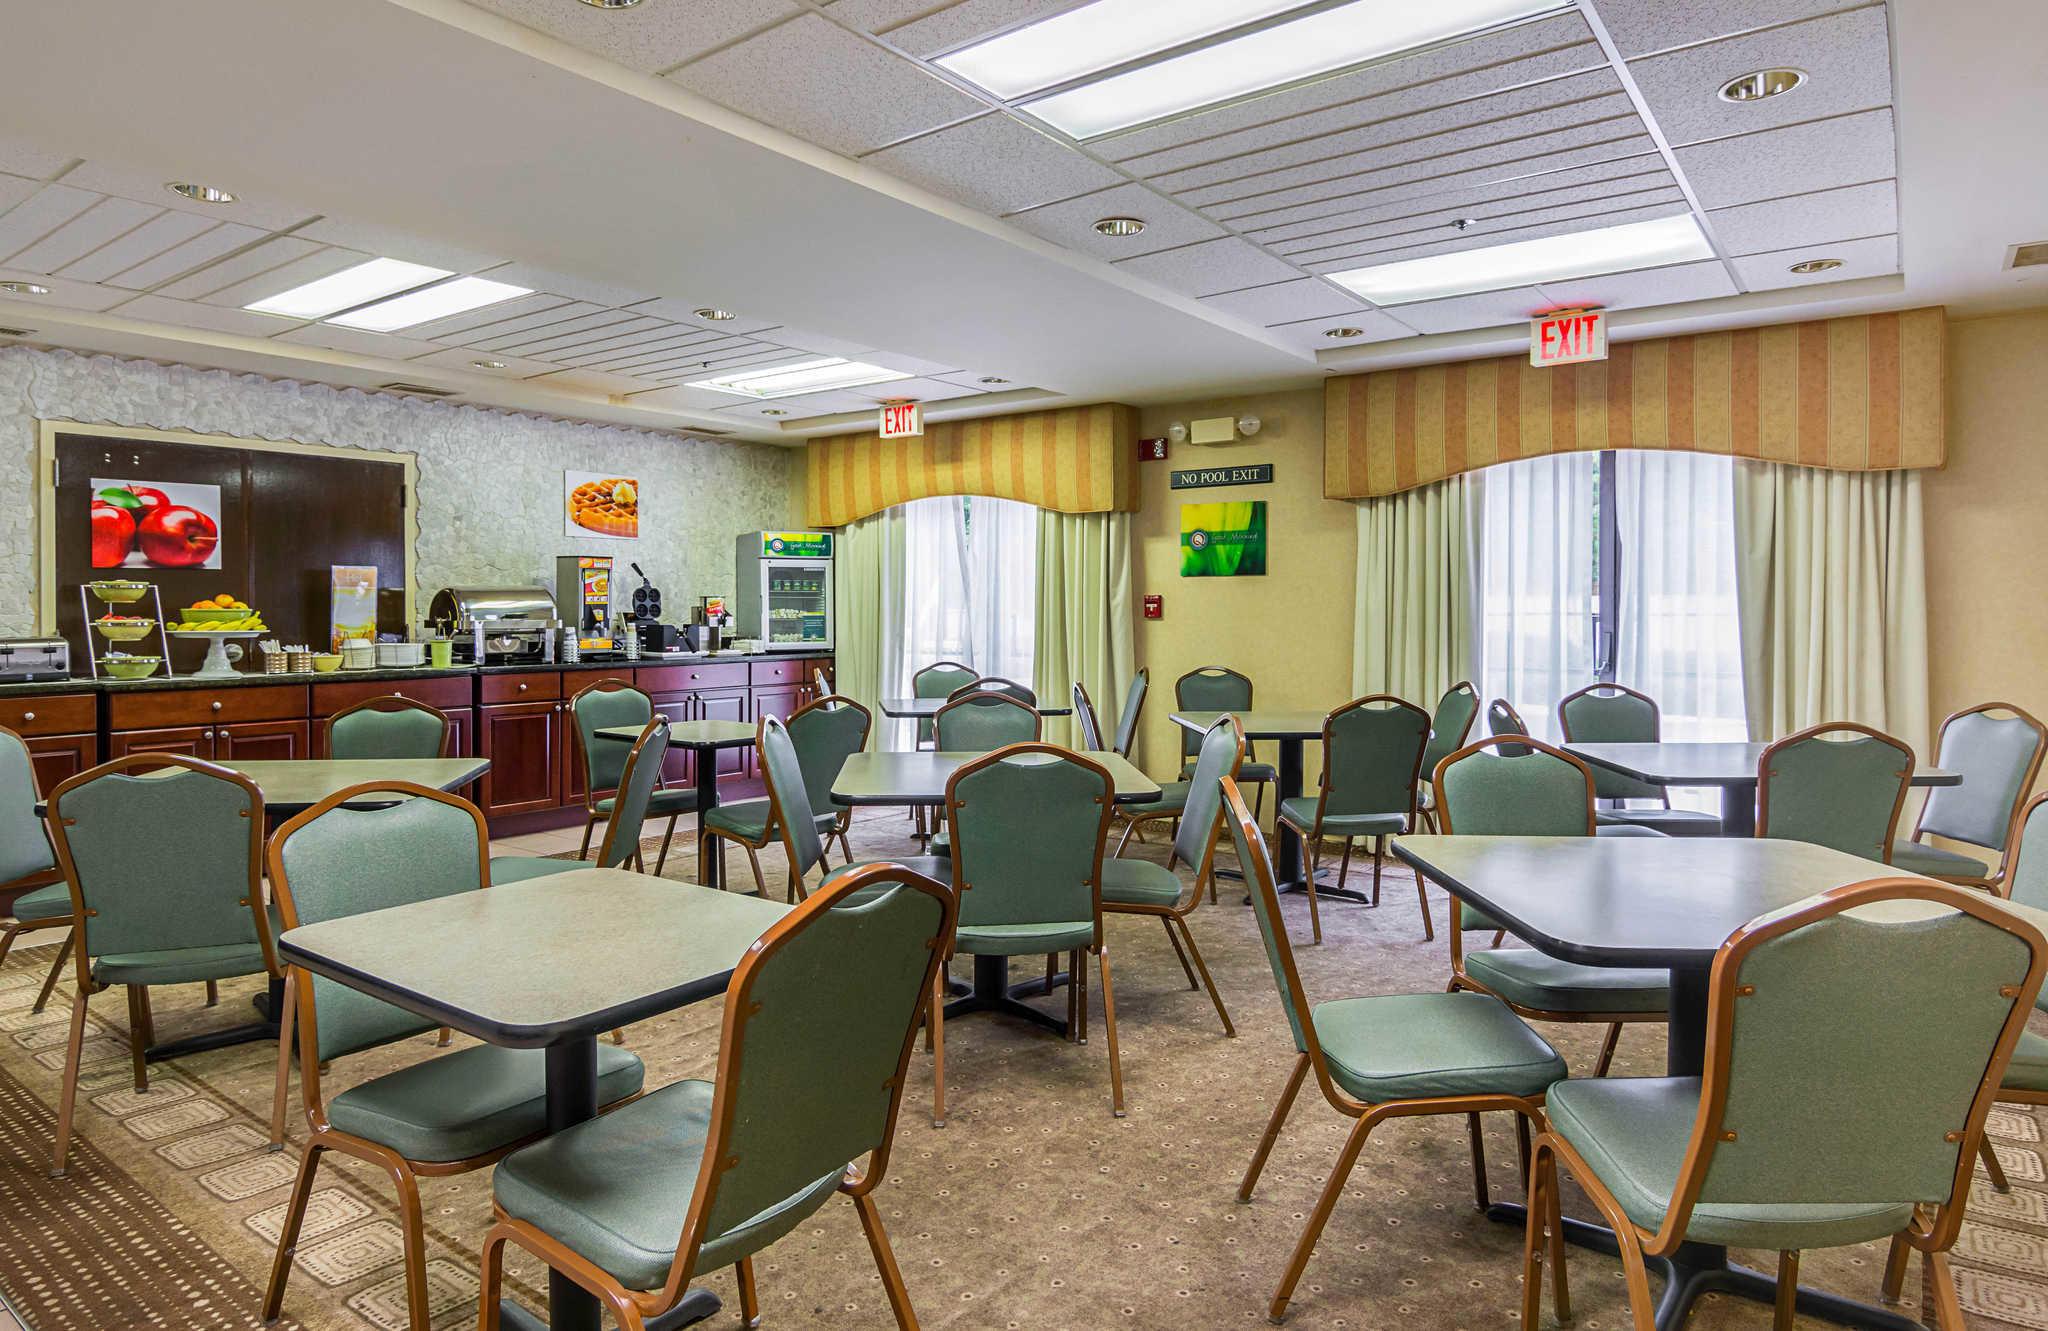 Quality Inn & Suites Kearneysville - Martinsburg image 22